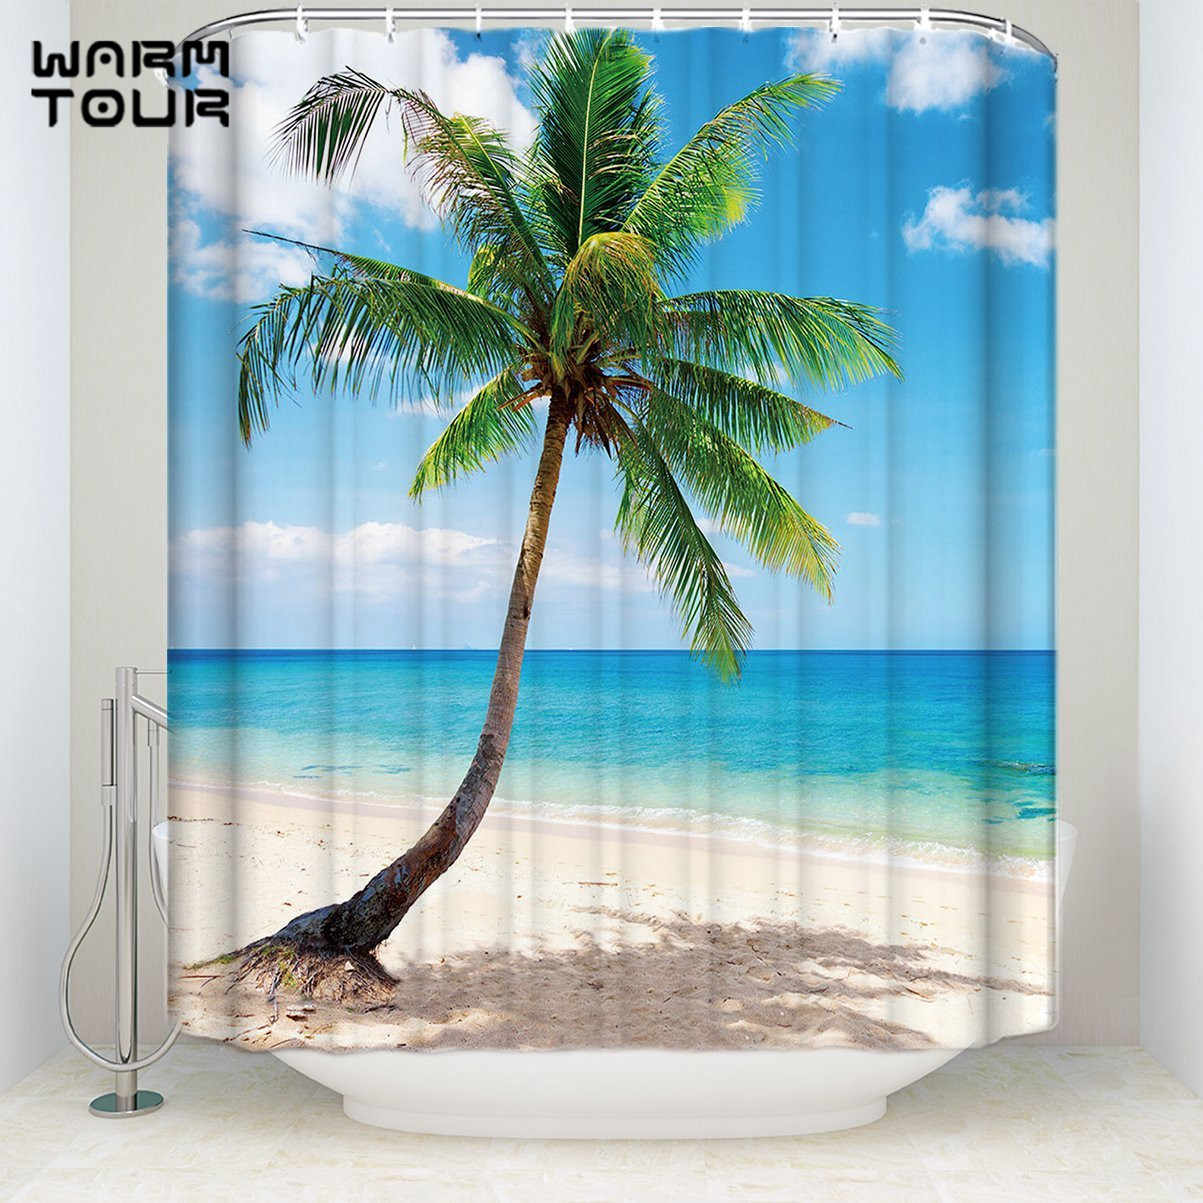 Bath Shower Curtains 72 X 72 Tropical Coconut Palm Tree Sandy Beach Mildew Resistant Bathroom Decor Sets With Hooks Shower Curtains Aliexpress